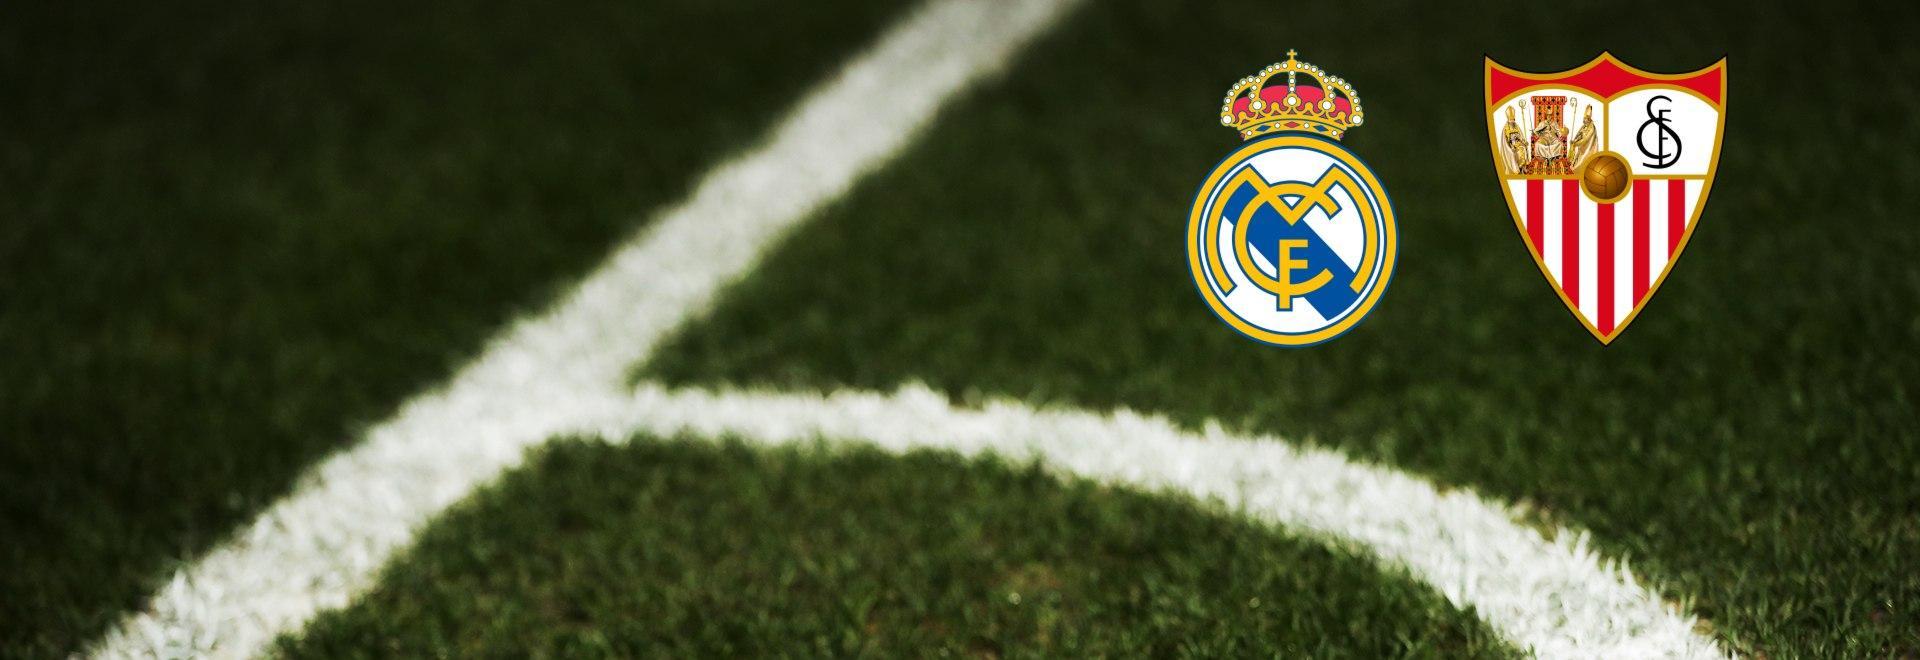 Real Madrid - Siviglia. 35a g.